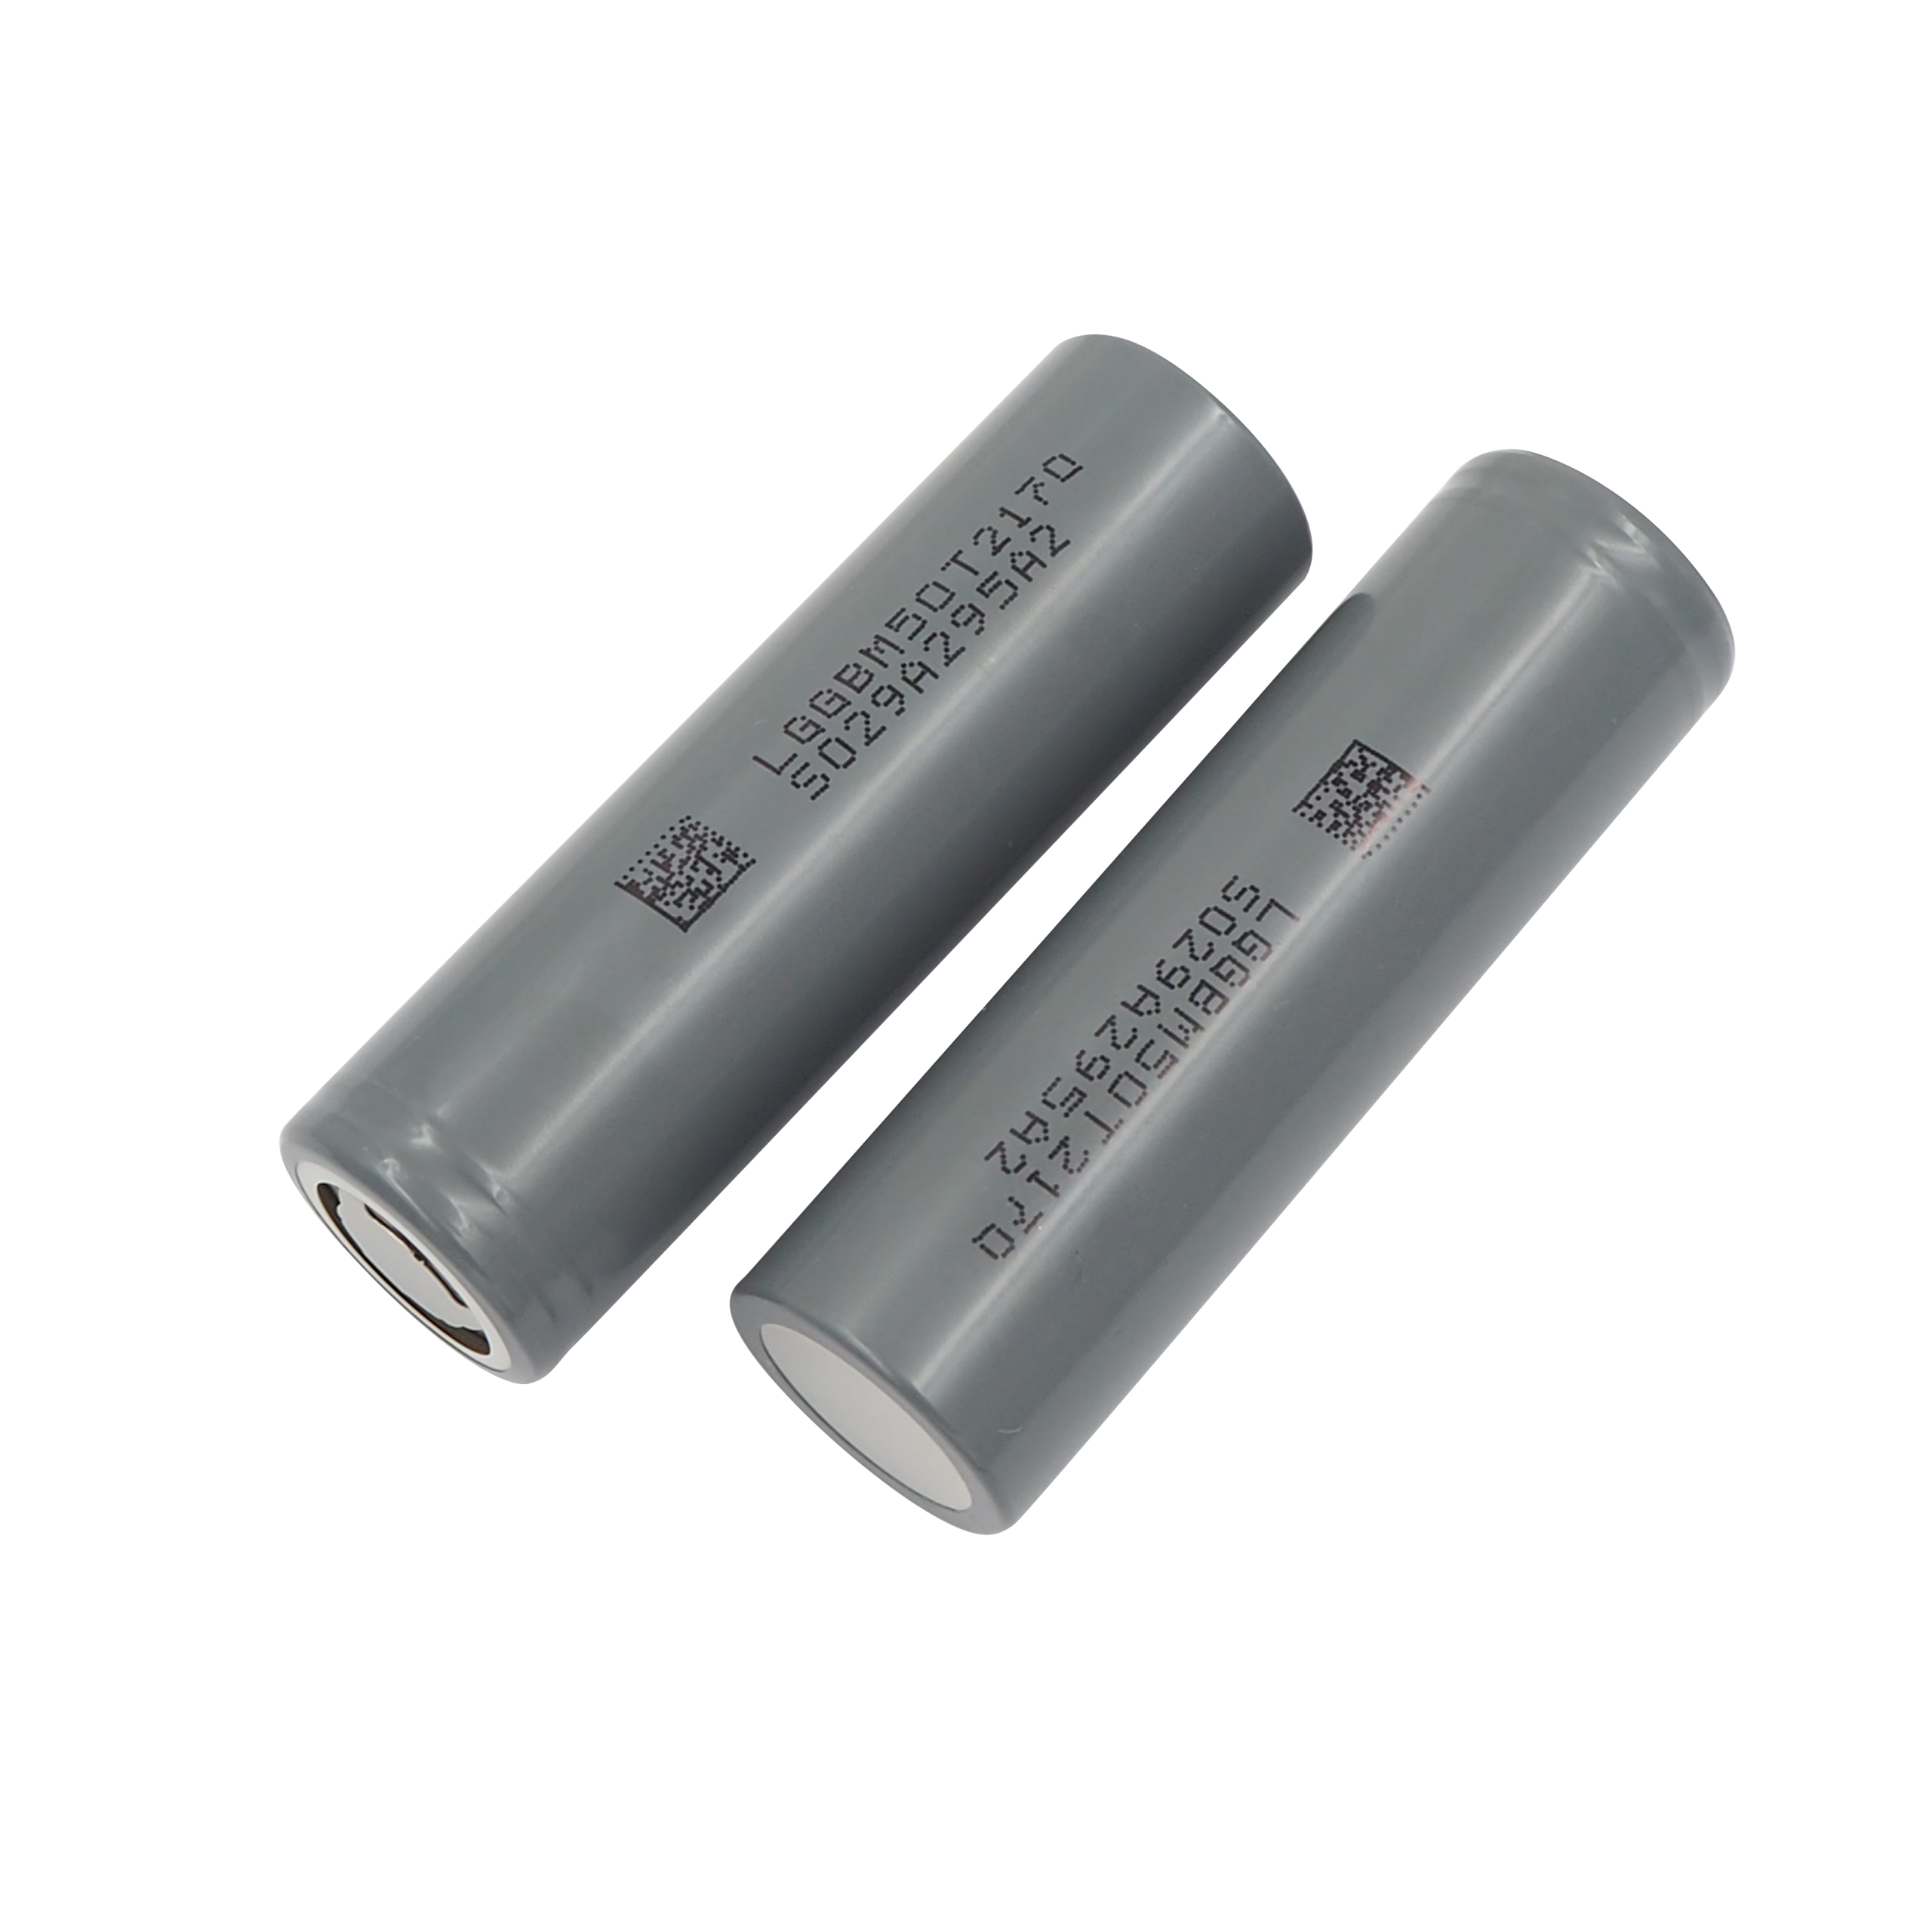 lg 21700 battery